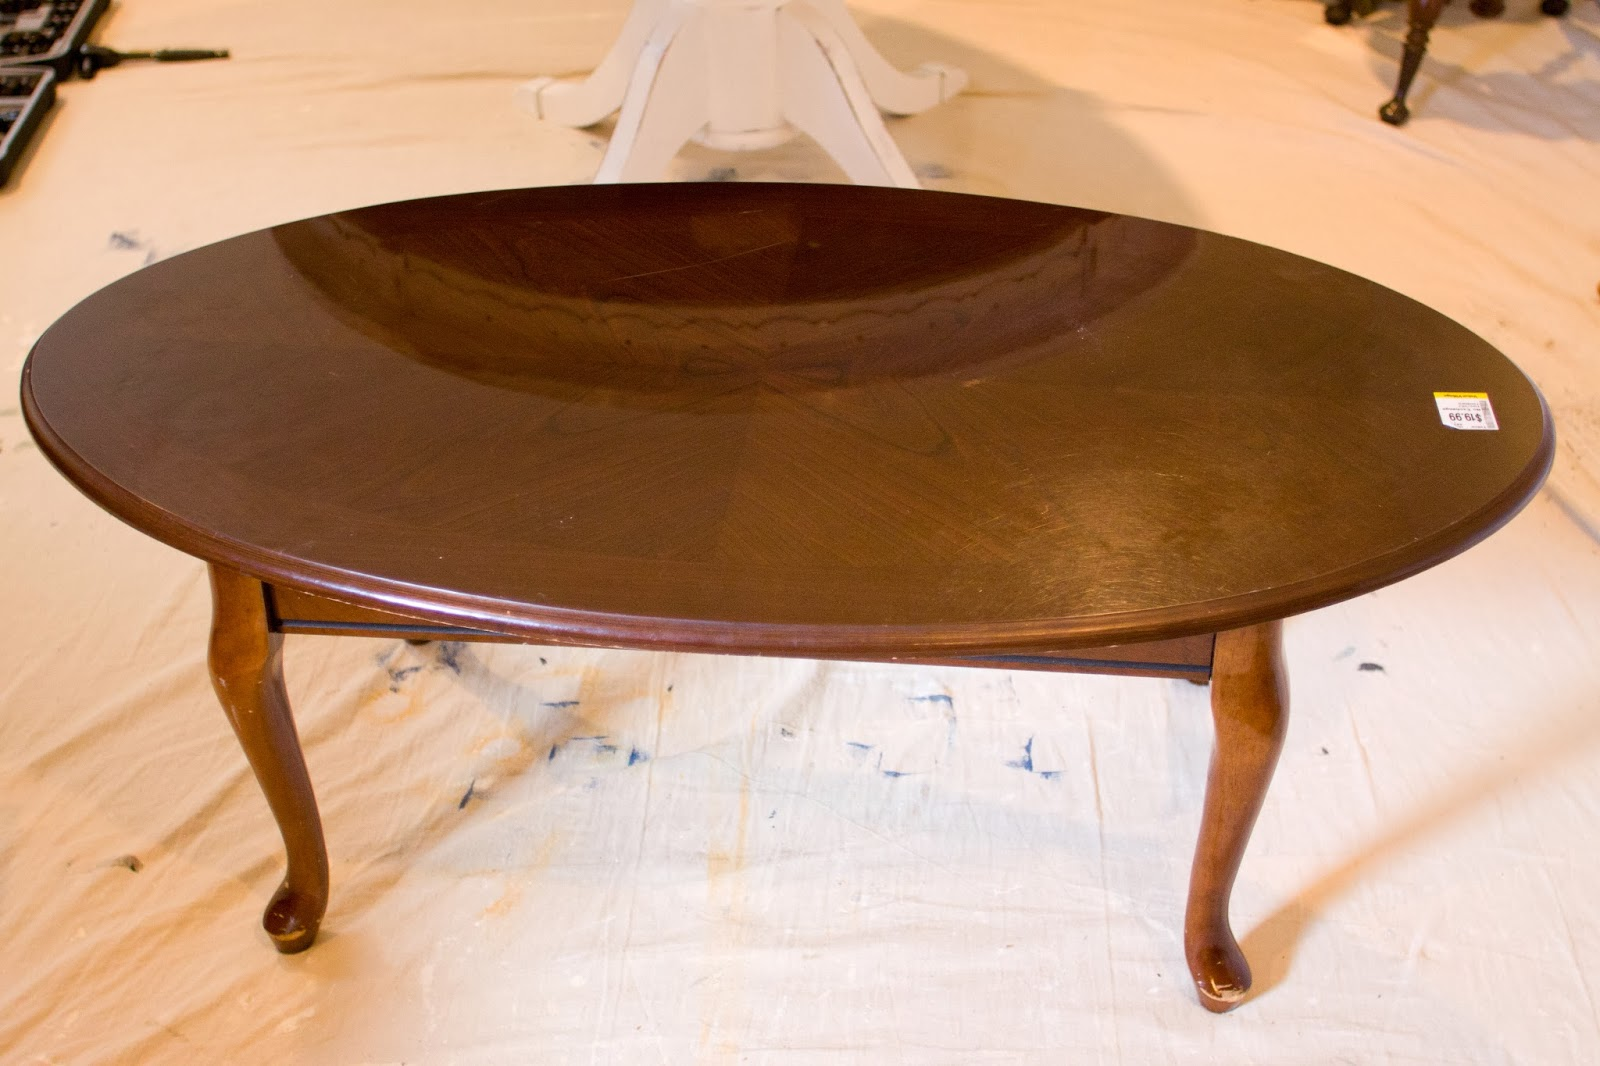 Sweet Tree Furniture Oval Coffee Table